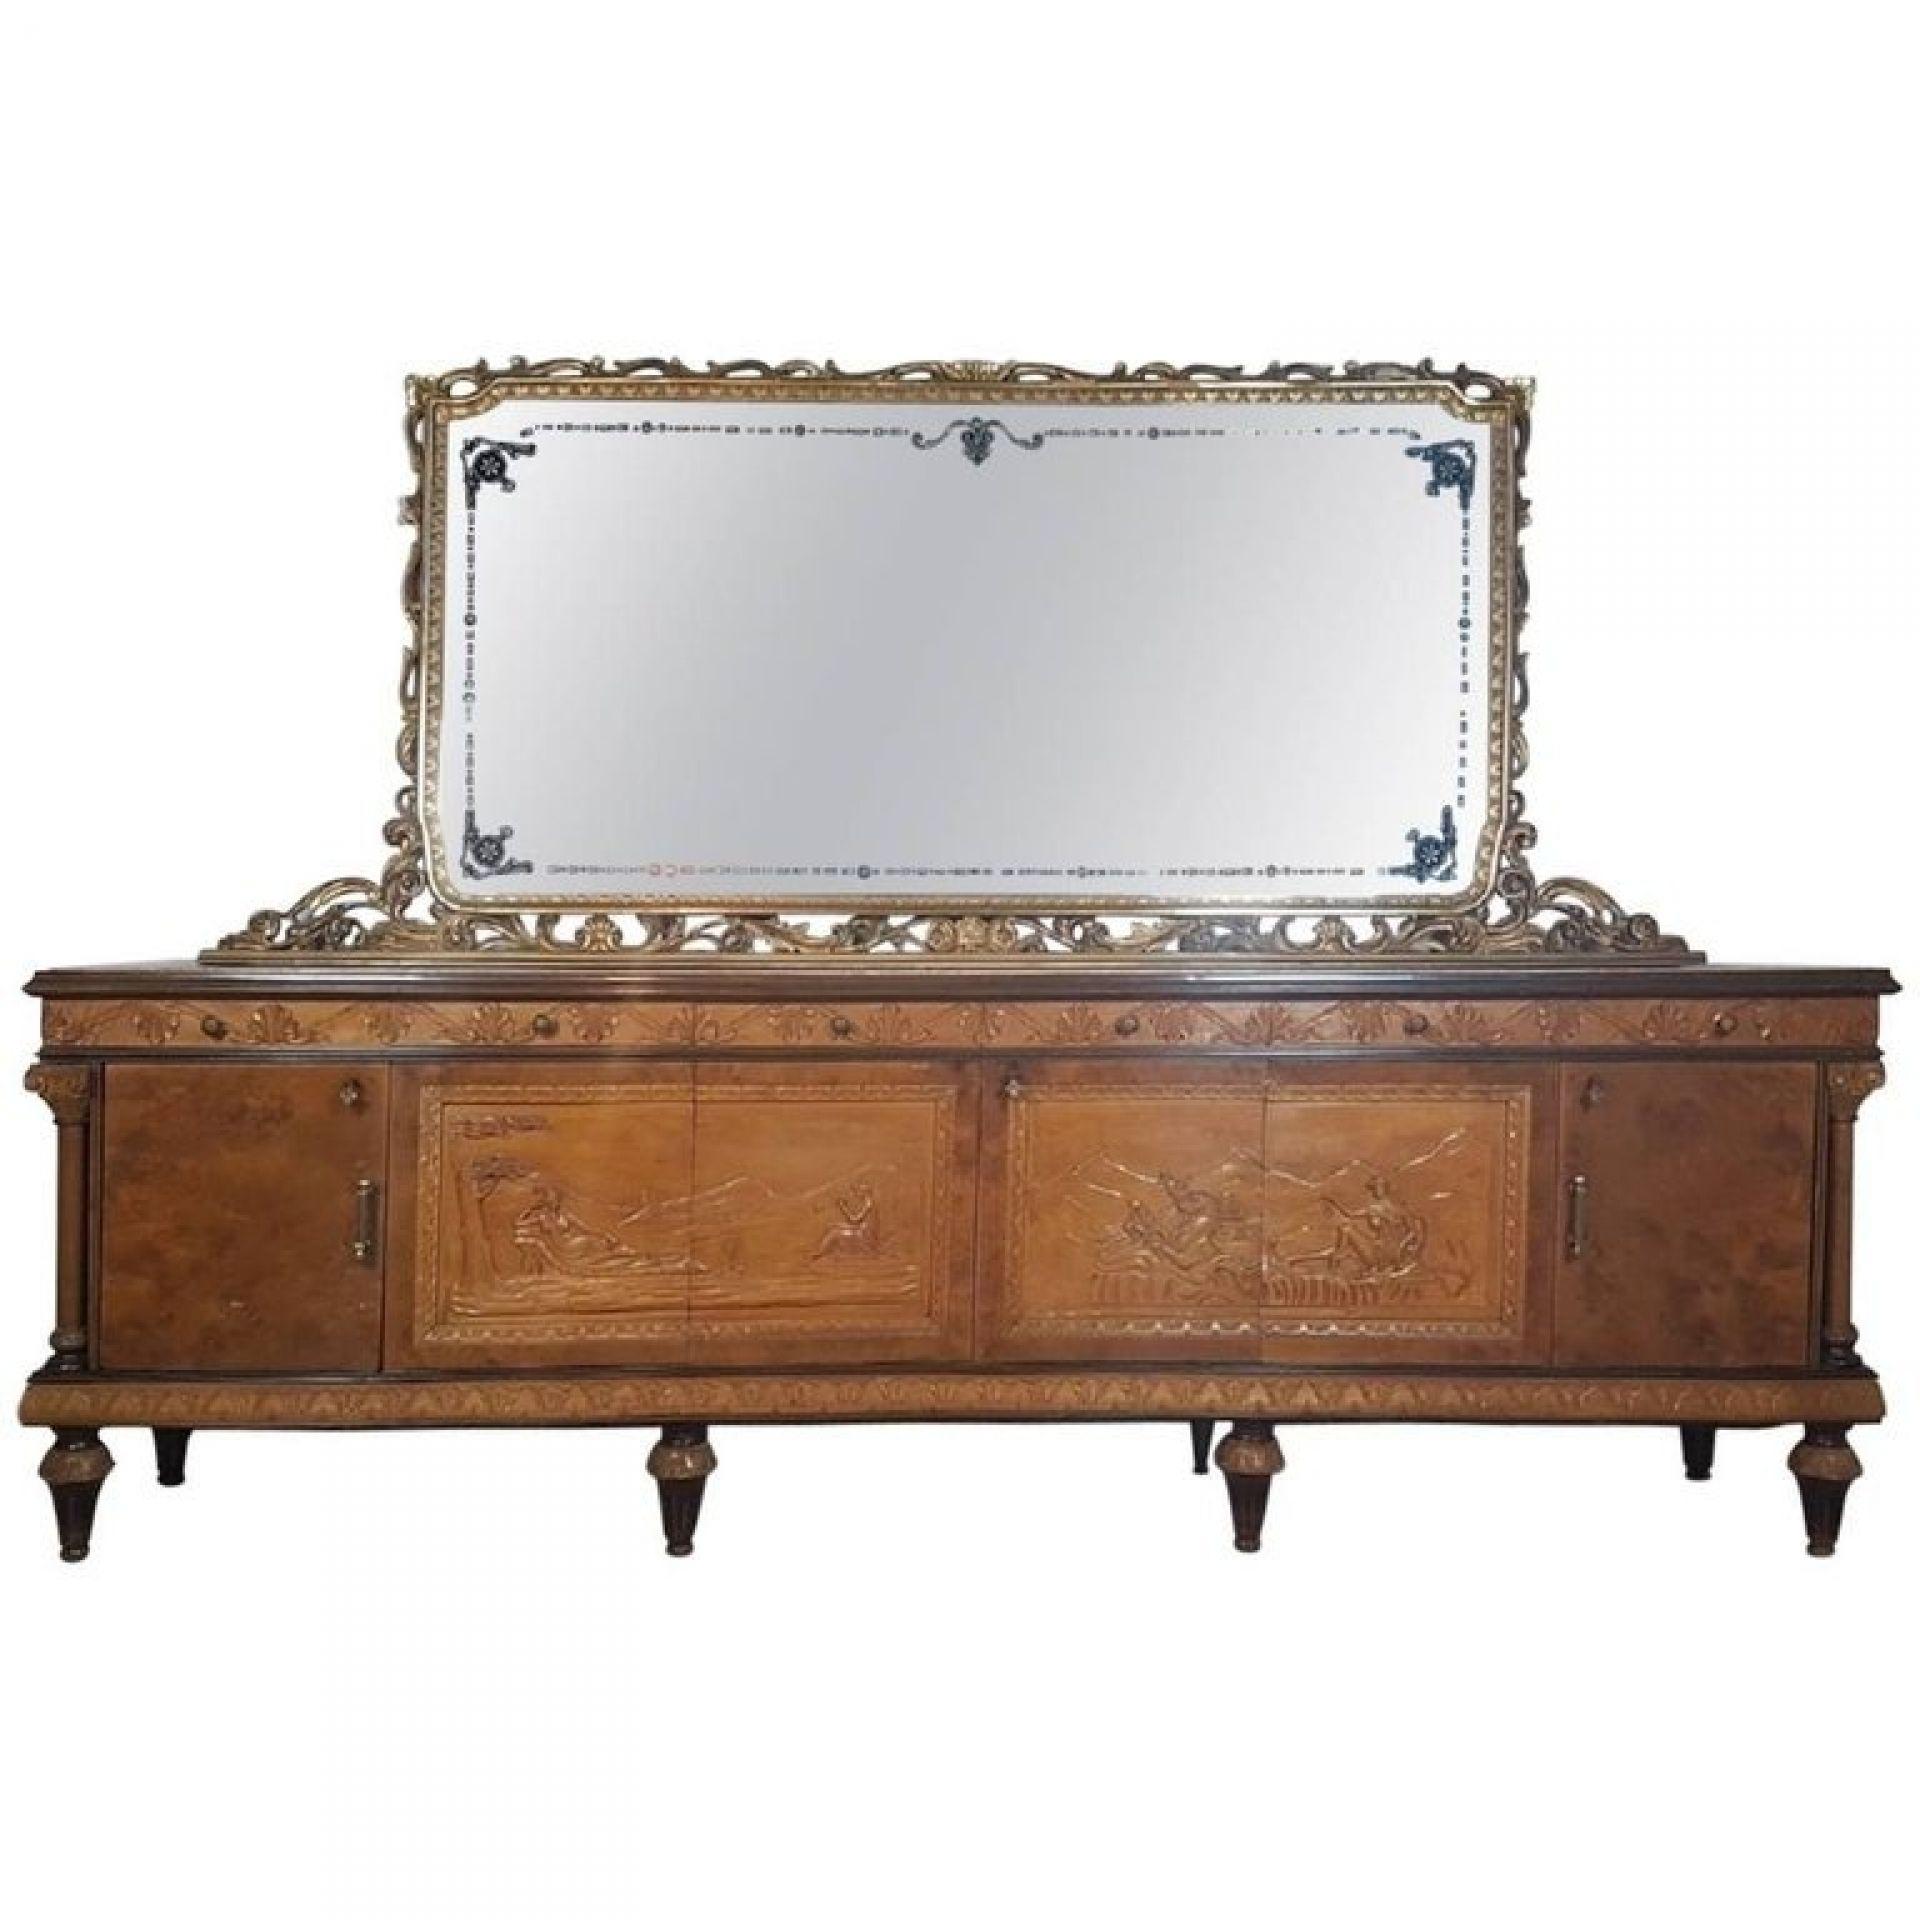 Italian Neoclassic Style Wood Briar, Gilt, Marble Luxury Dining Room Set